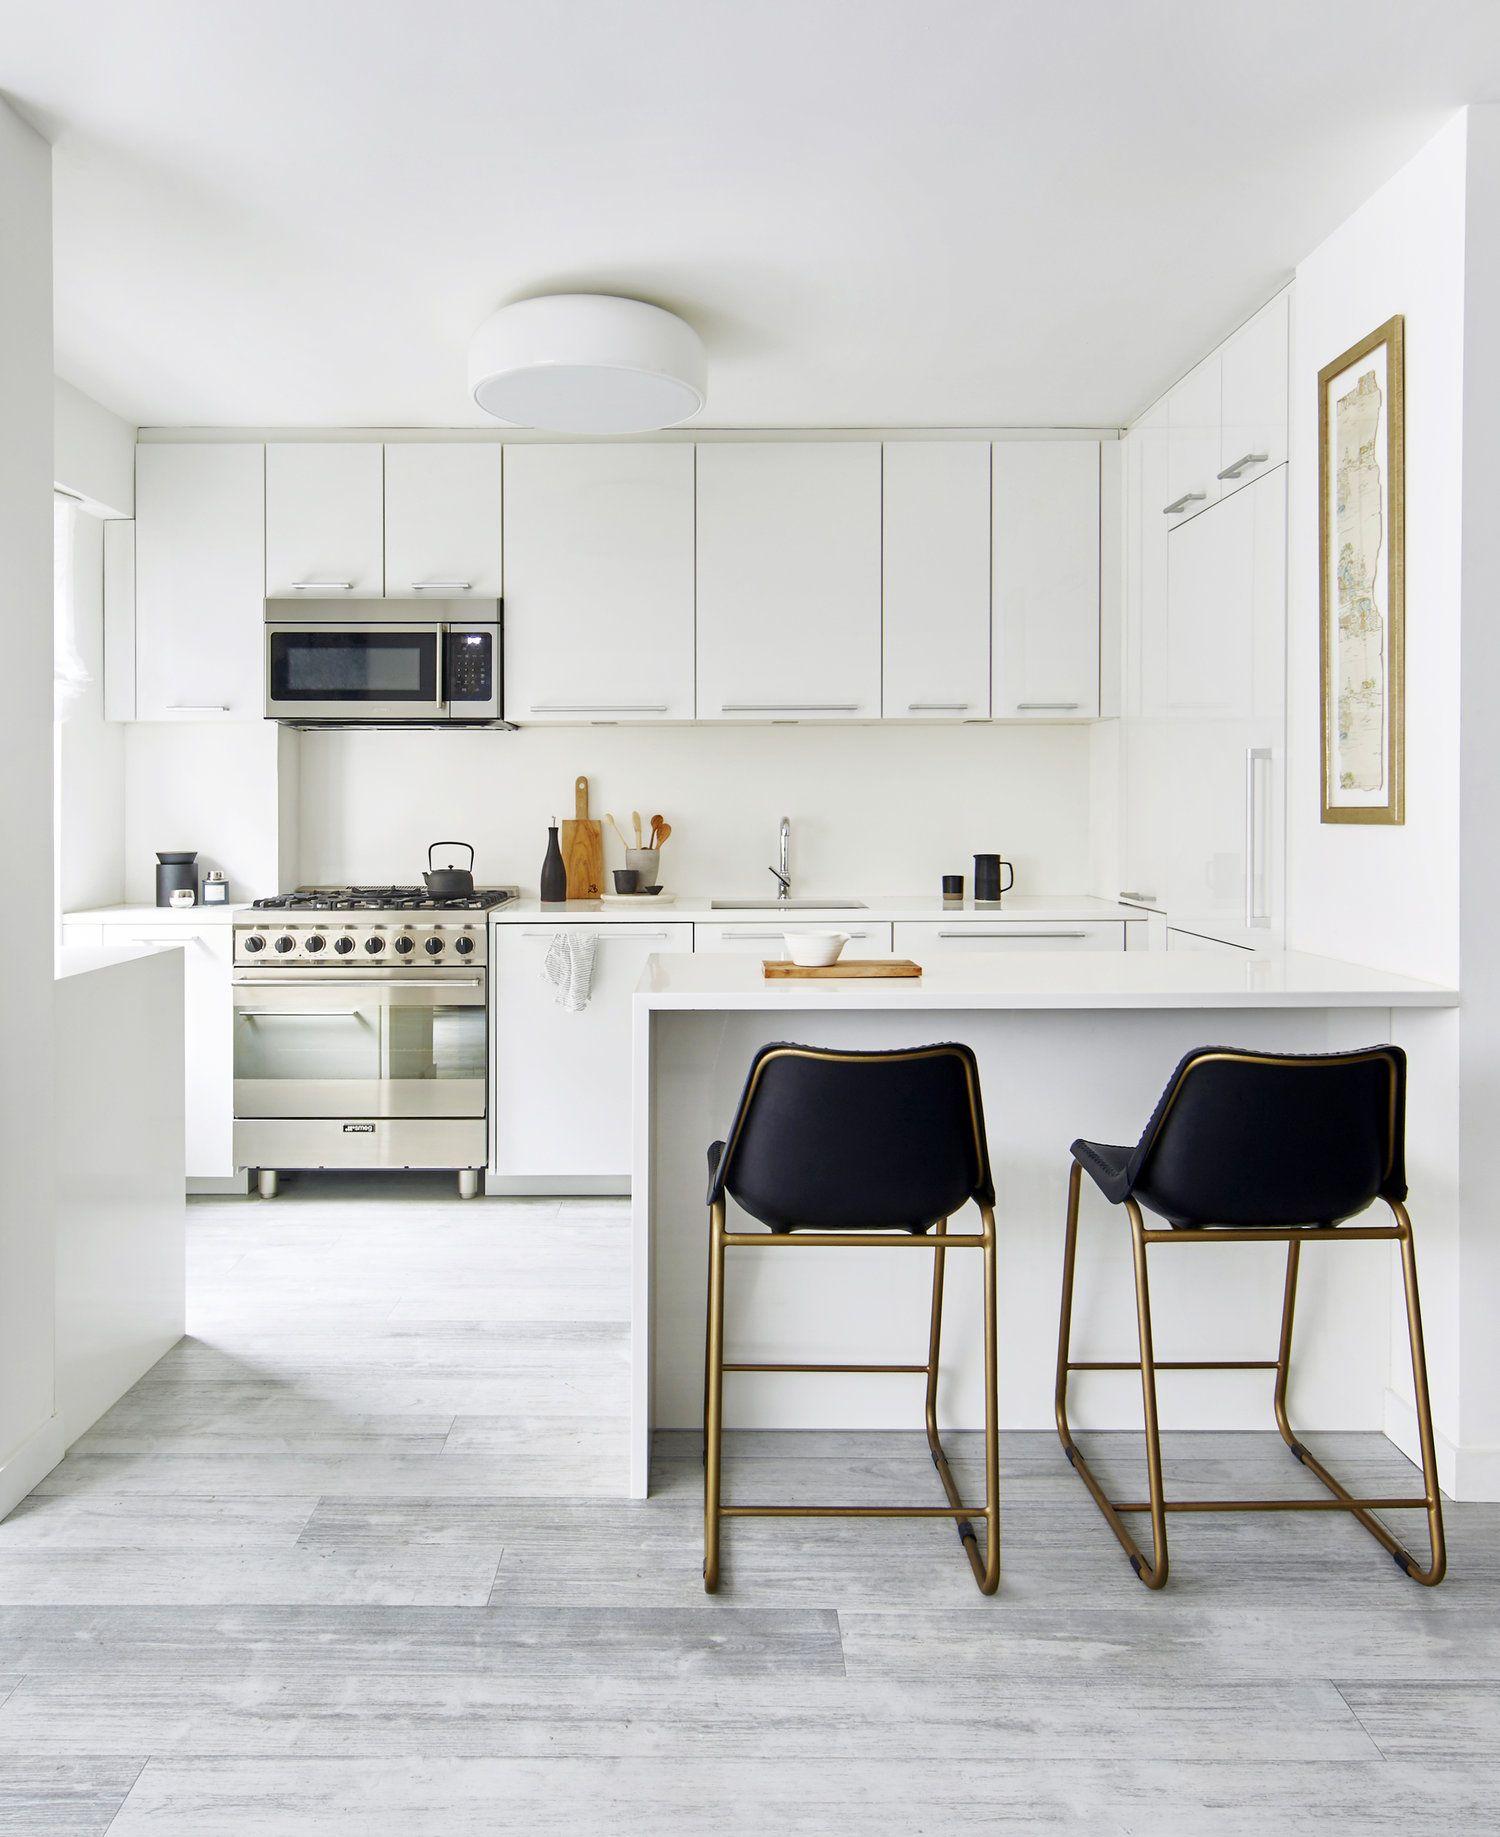 Manhattan New York Studio Apartments: Custom Kitchen Design In New York City Designed By Tina